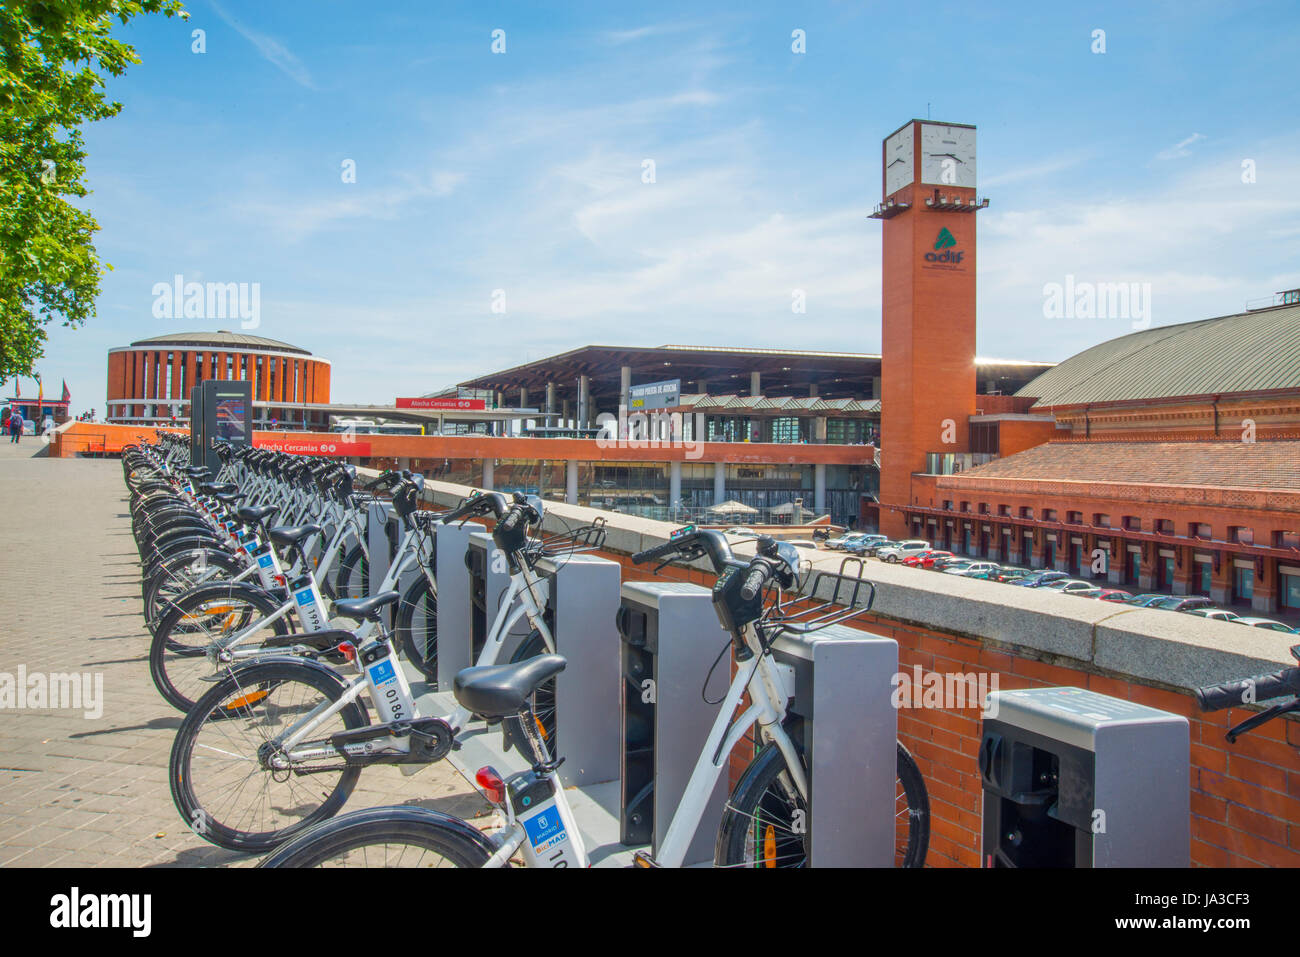 BiciMad bike parking and Puerta de Atocha Railway Station. Atocha street, Madrid, Spain. - Stock Image